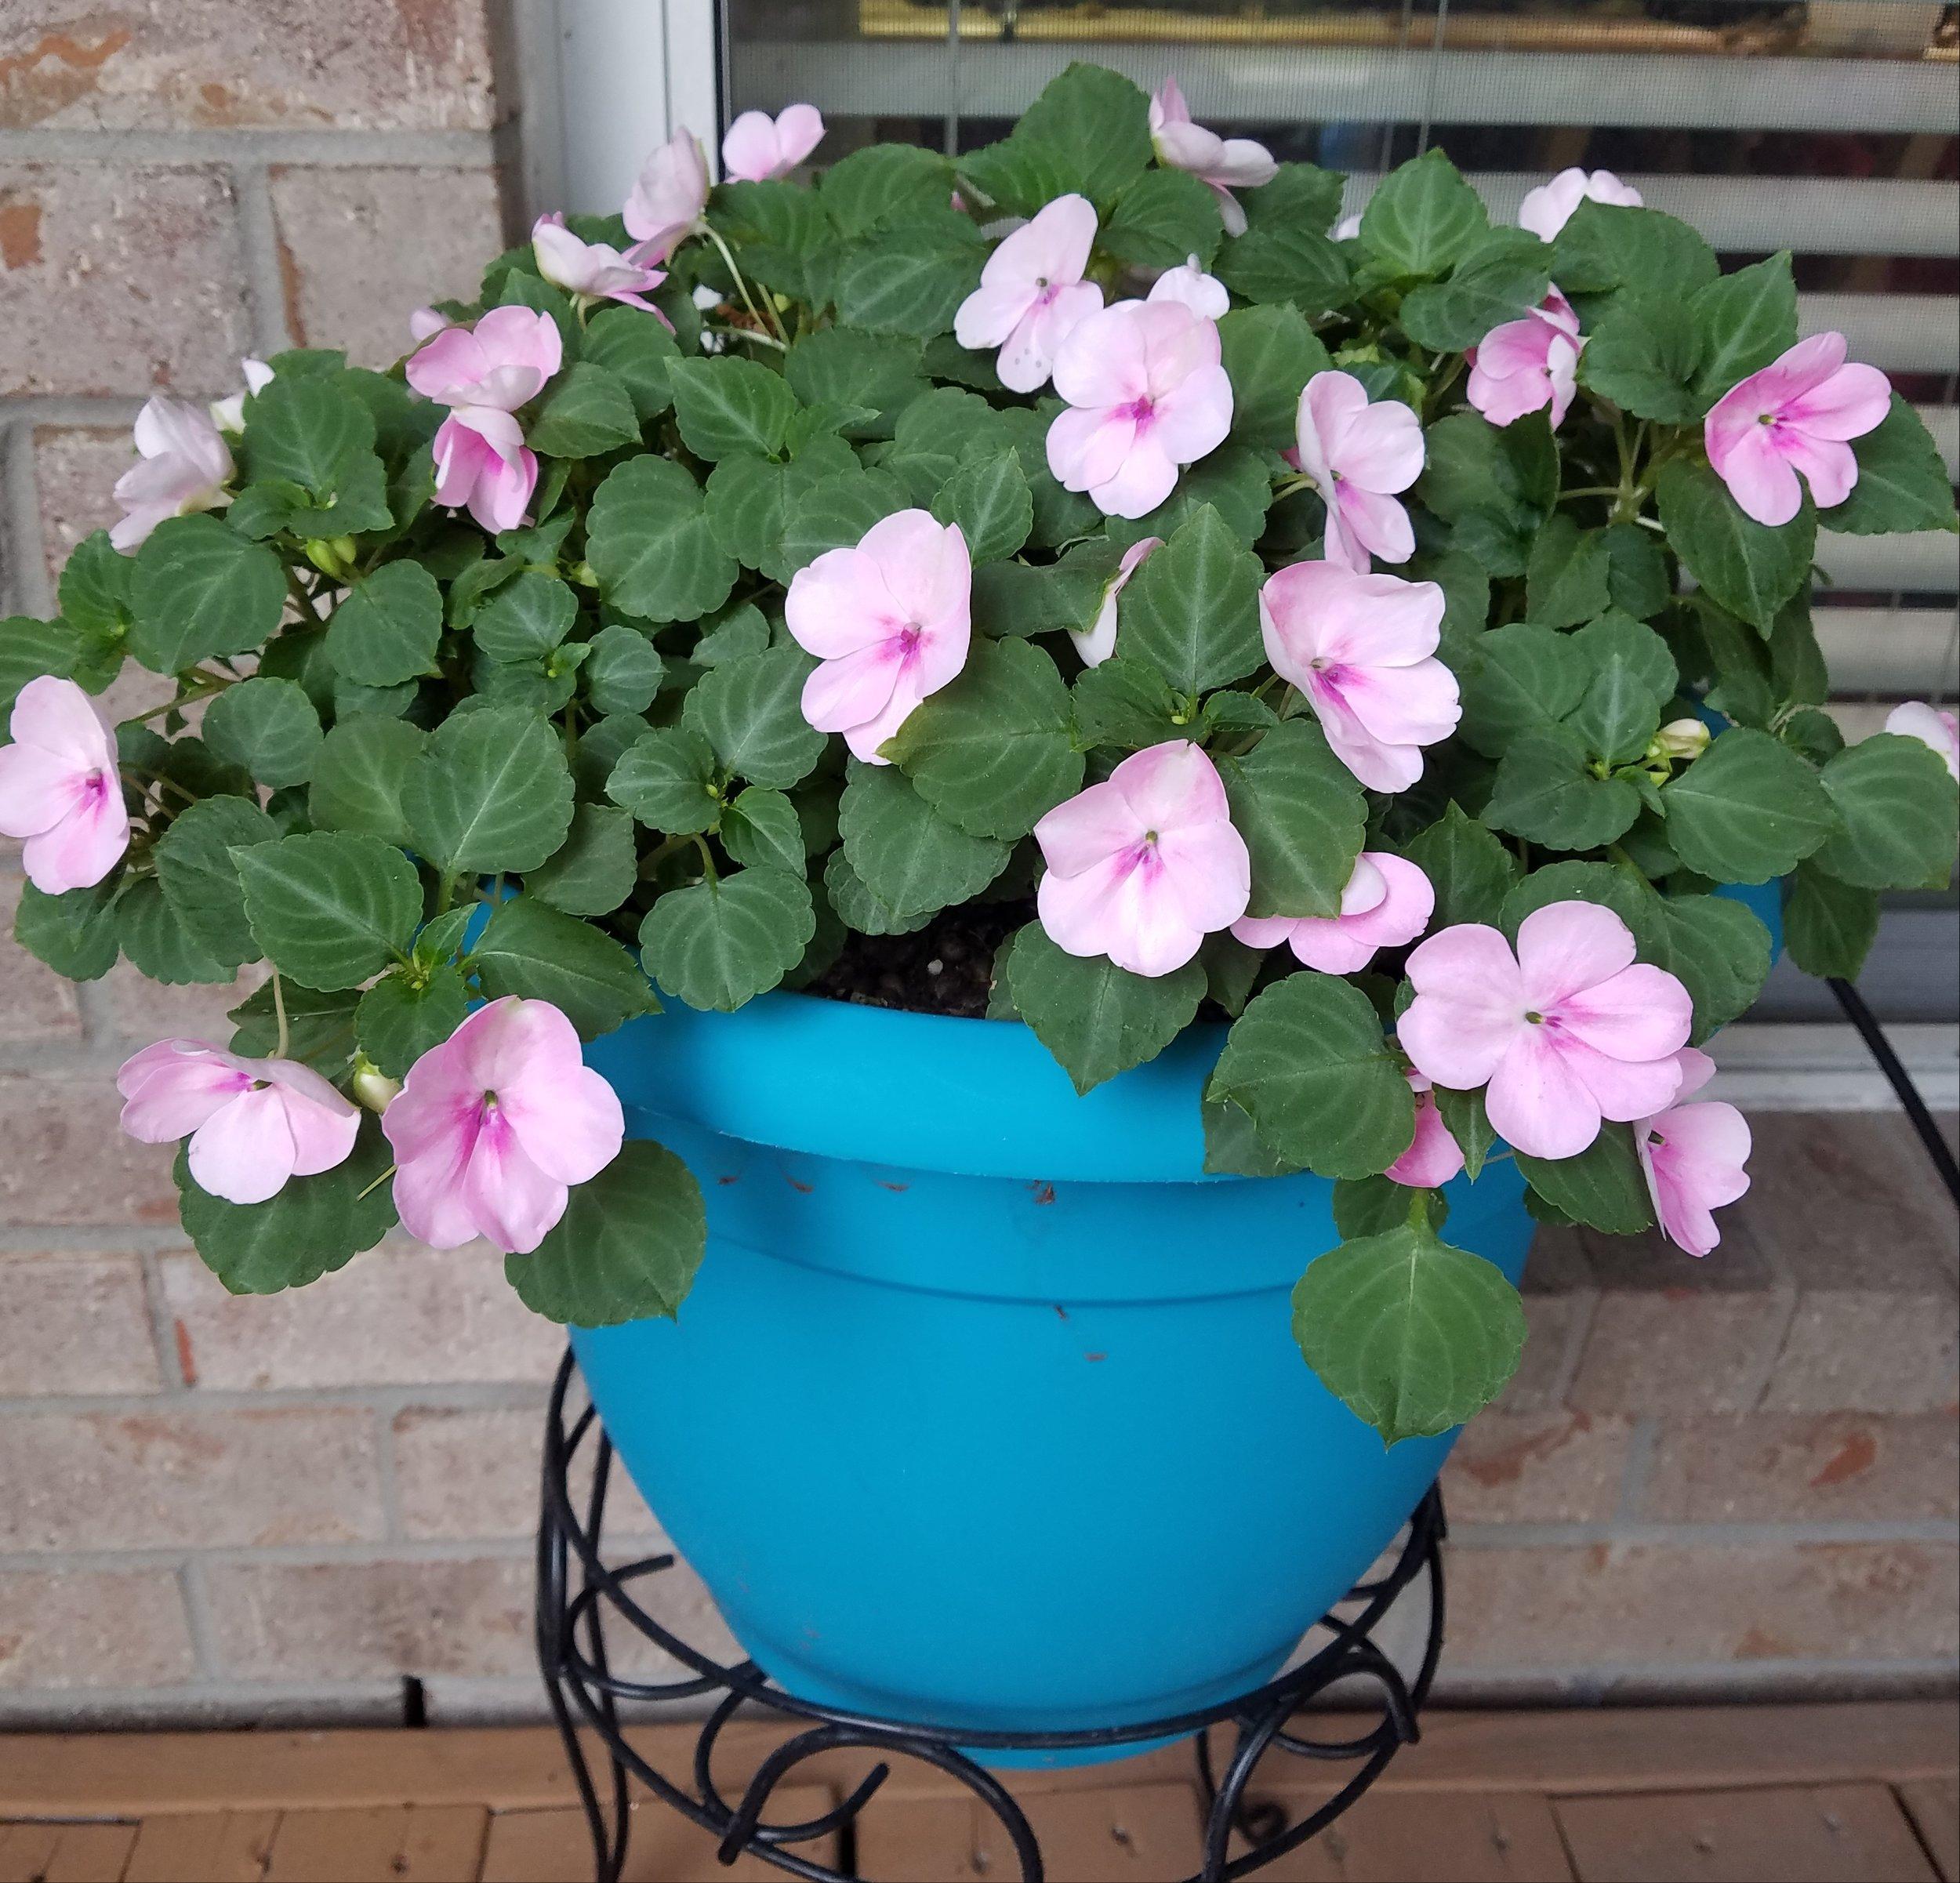 Mama Yardful's impatiens all pretty in pink!